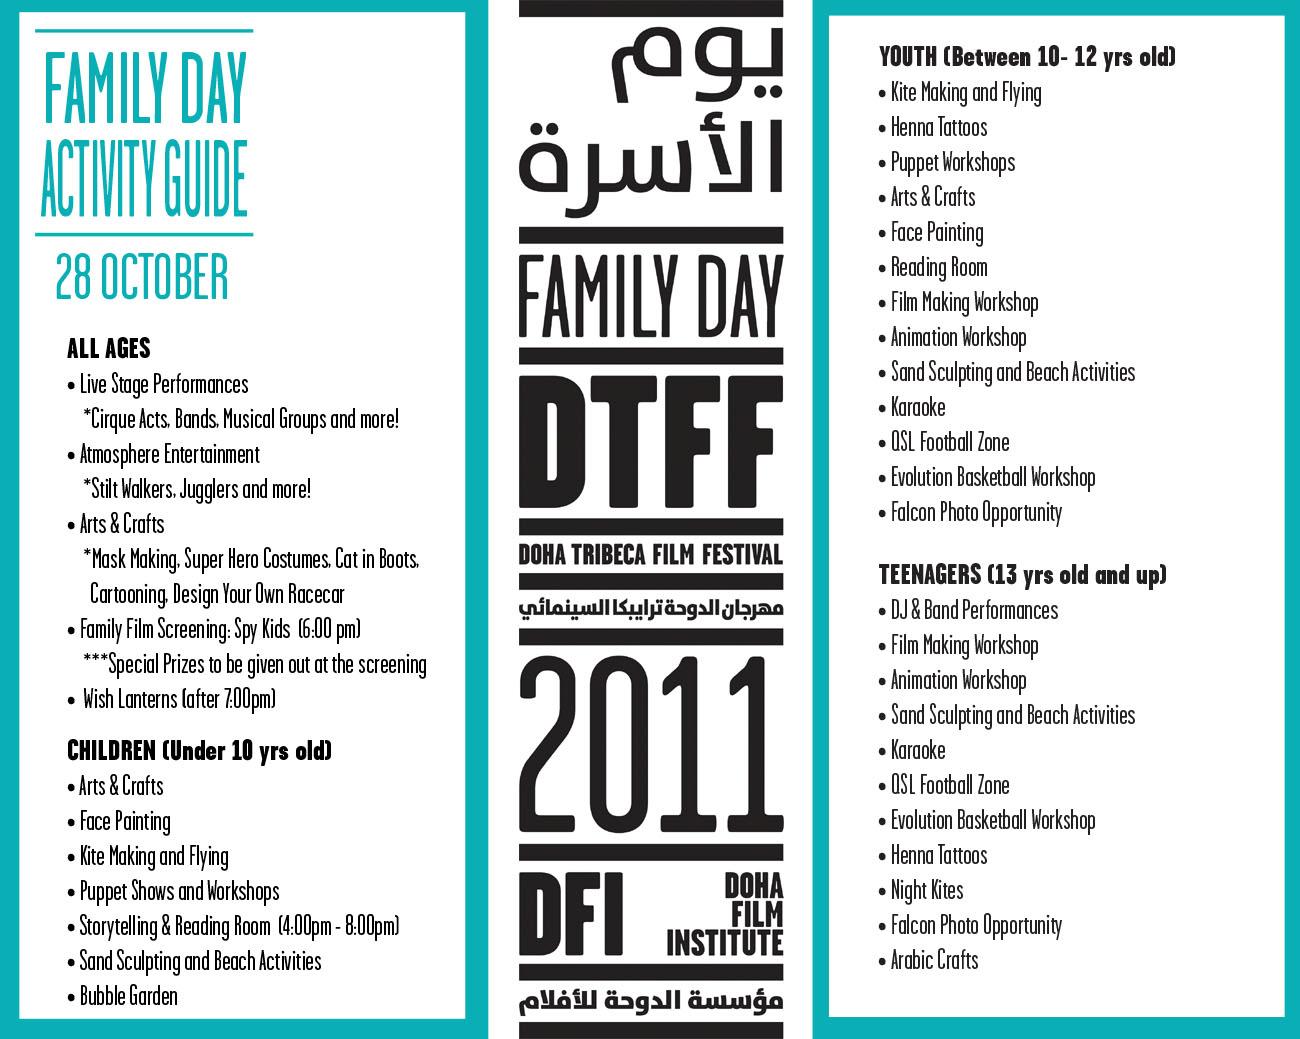 family programmes at the 2011 doha tribeca film festival